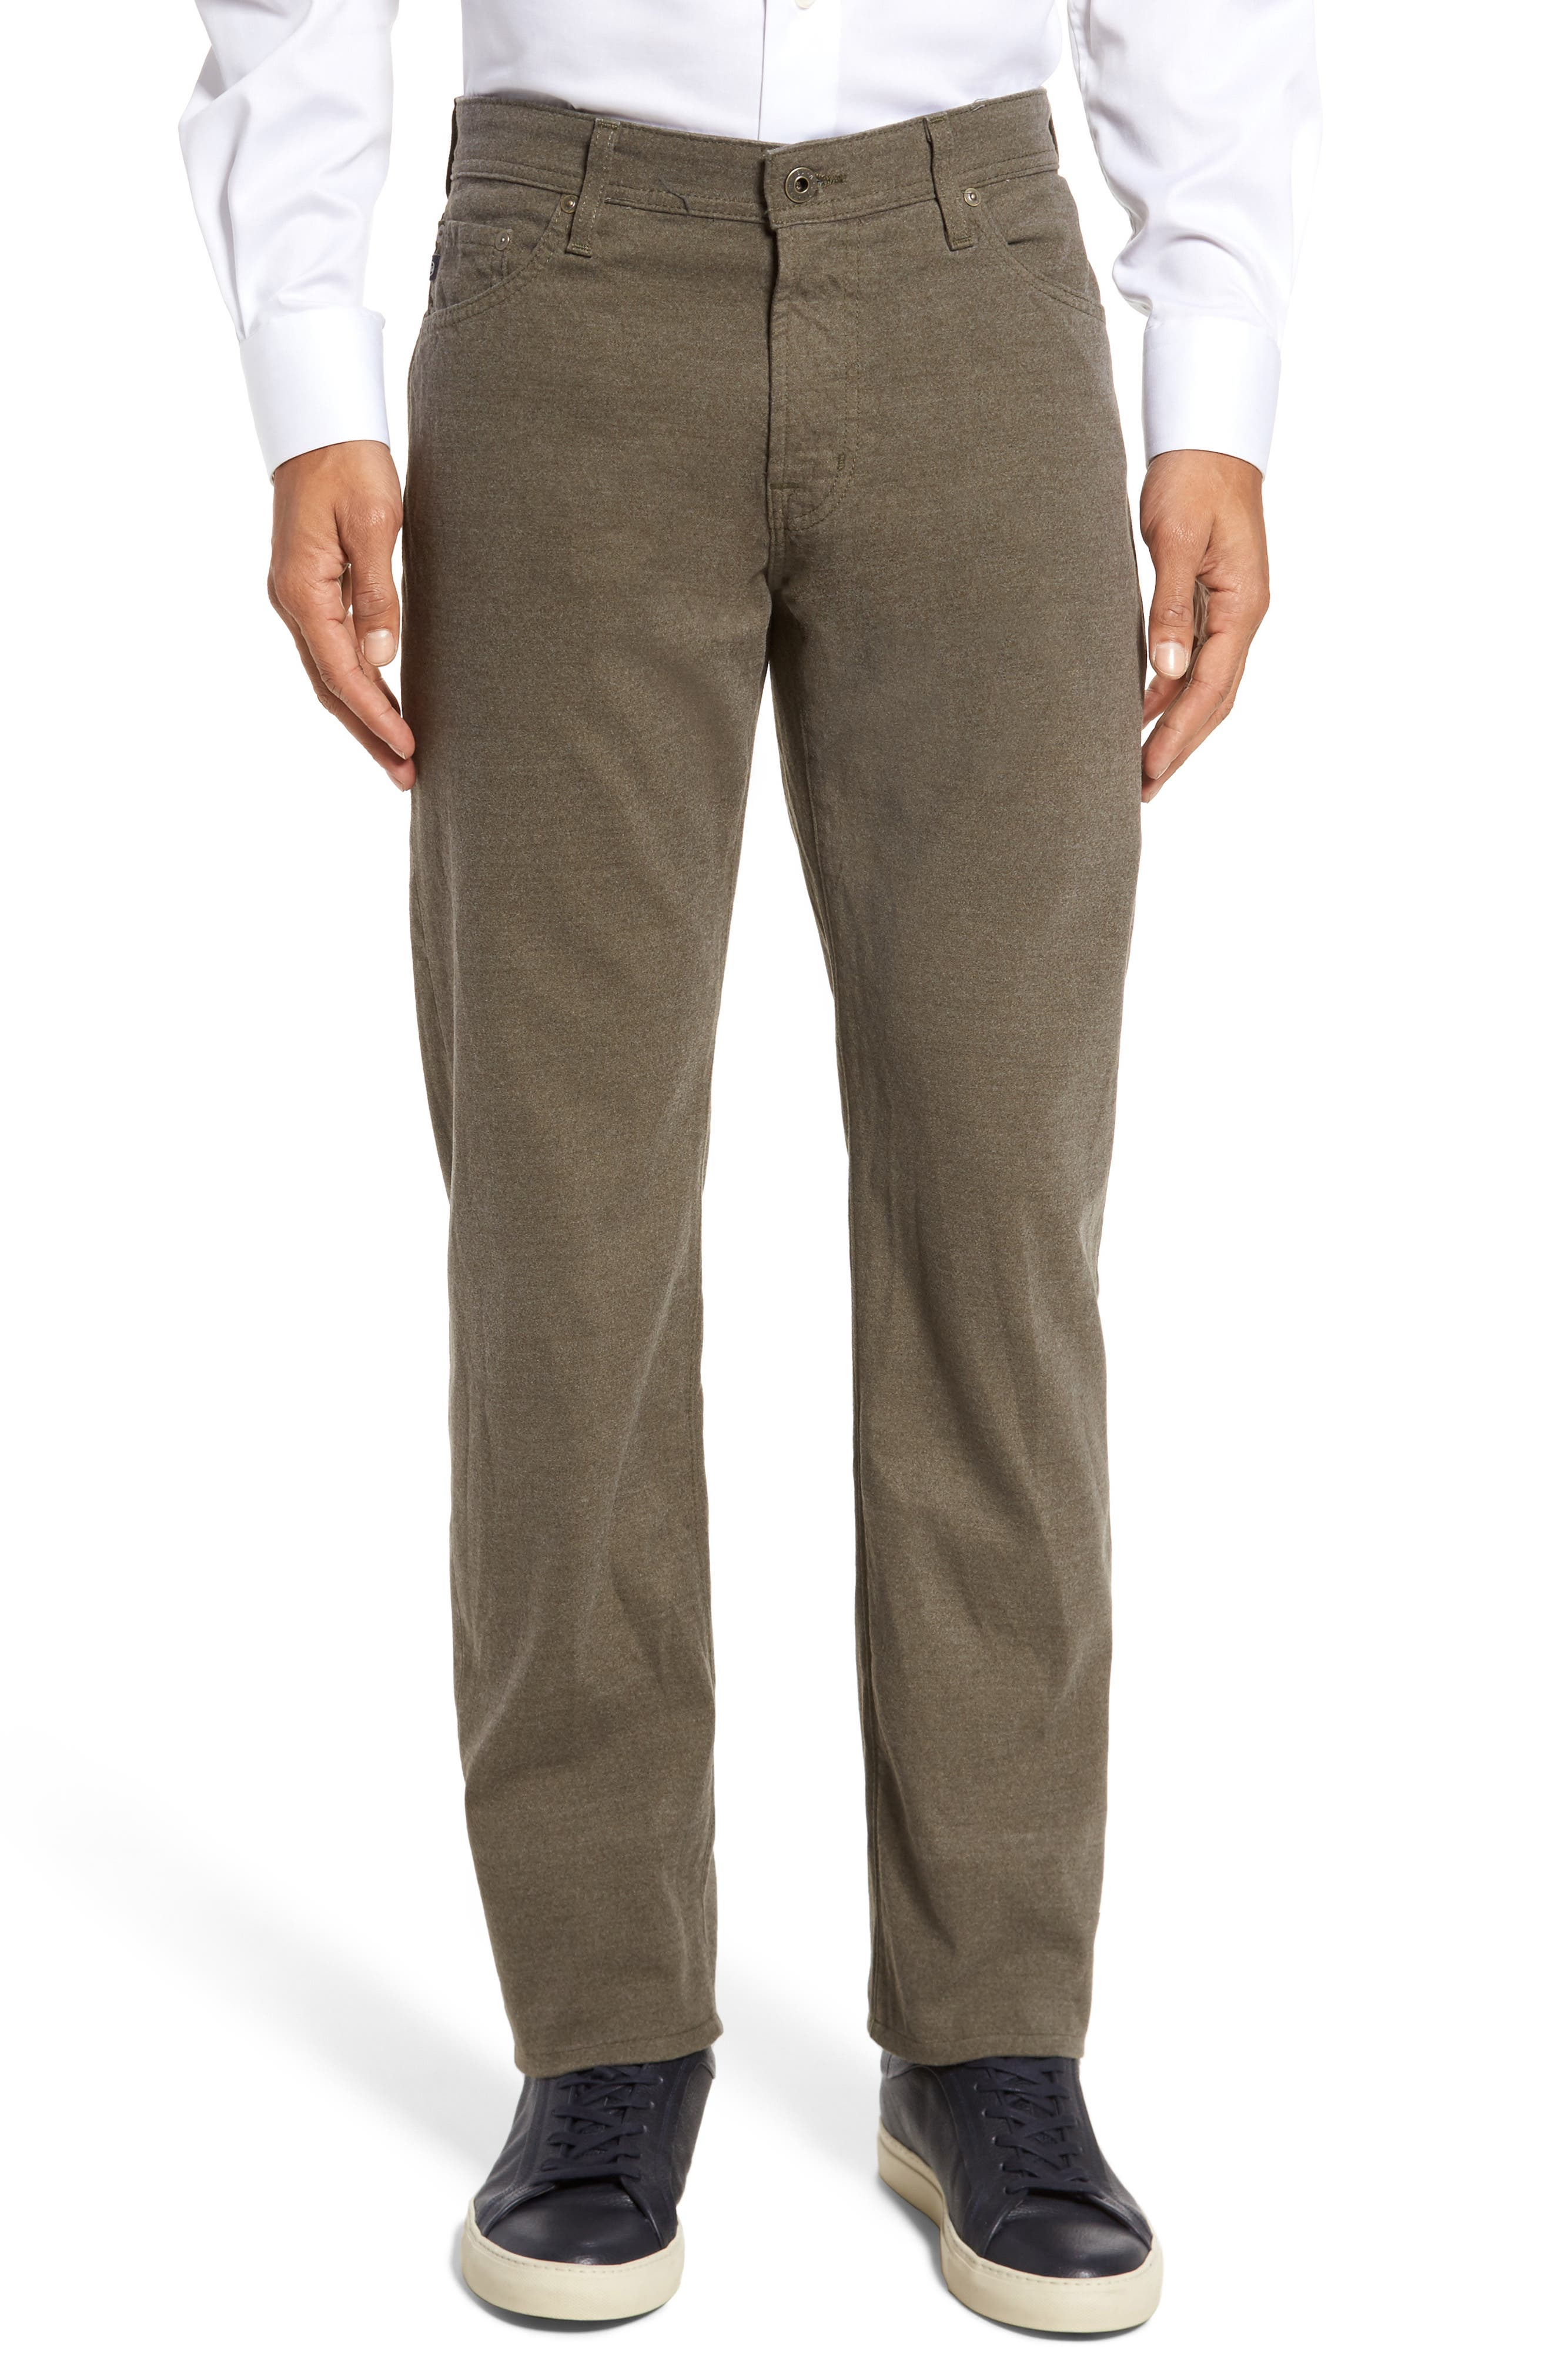 Graduate Tailored Five-Pocket Straight Leg Pants,                         Main,                         color, CLIMBING IVY